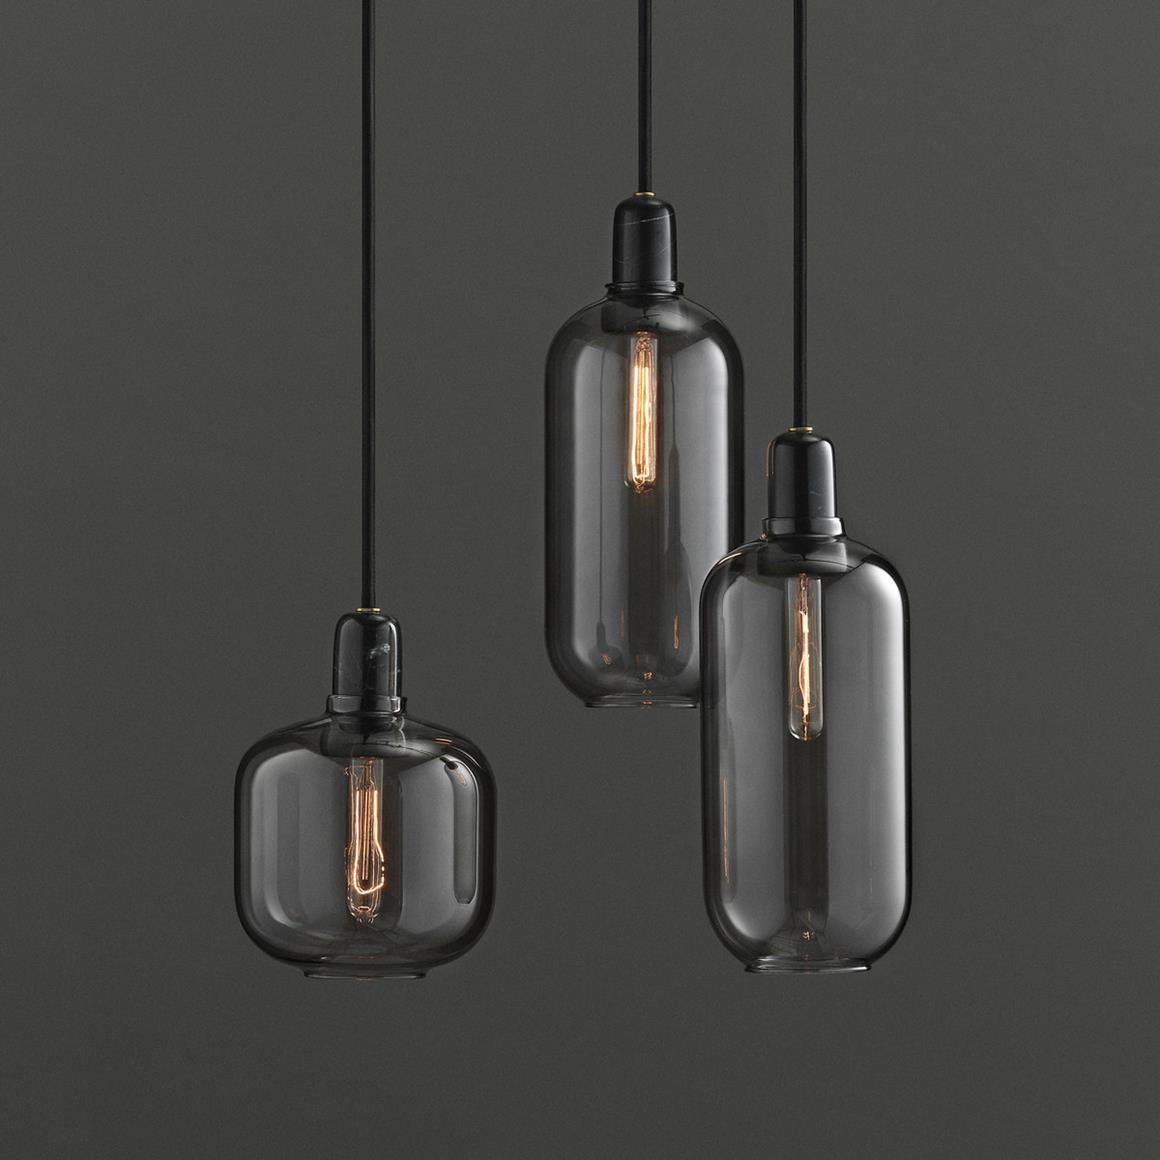 Amp-Lamp-Haengeleuchte-Smoke-Black-Gruppe.142148